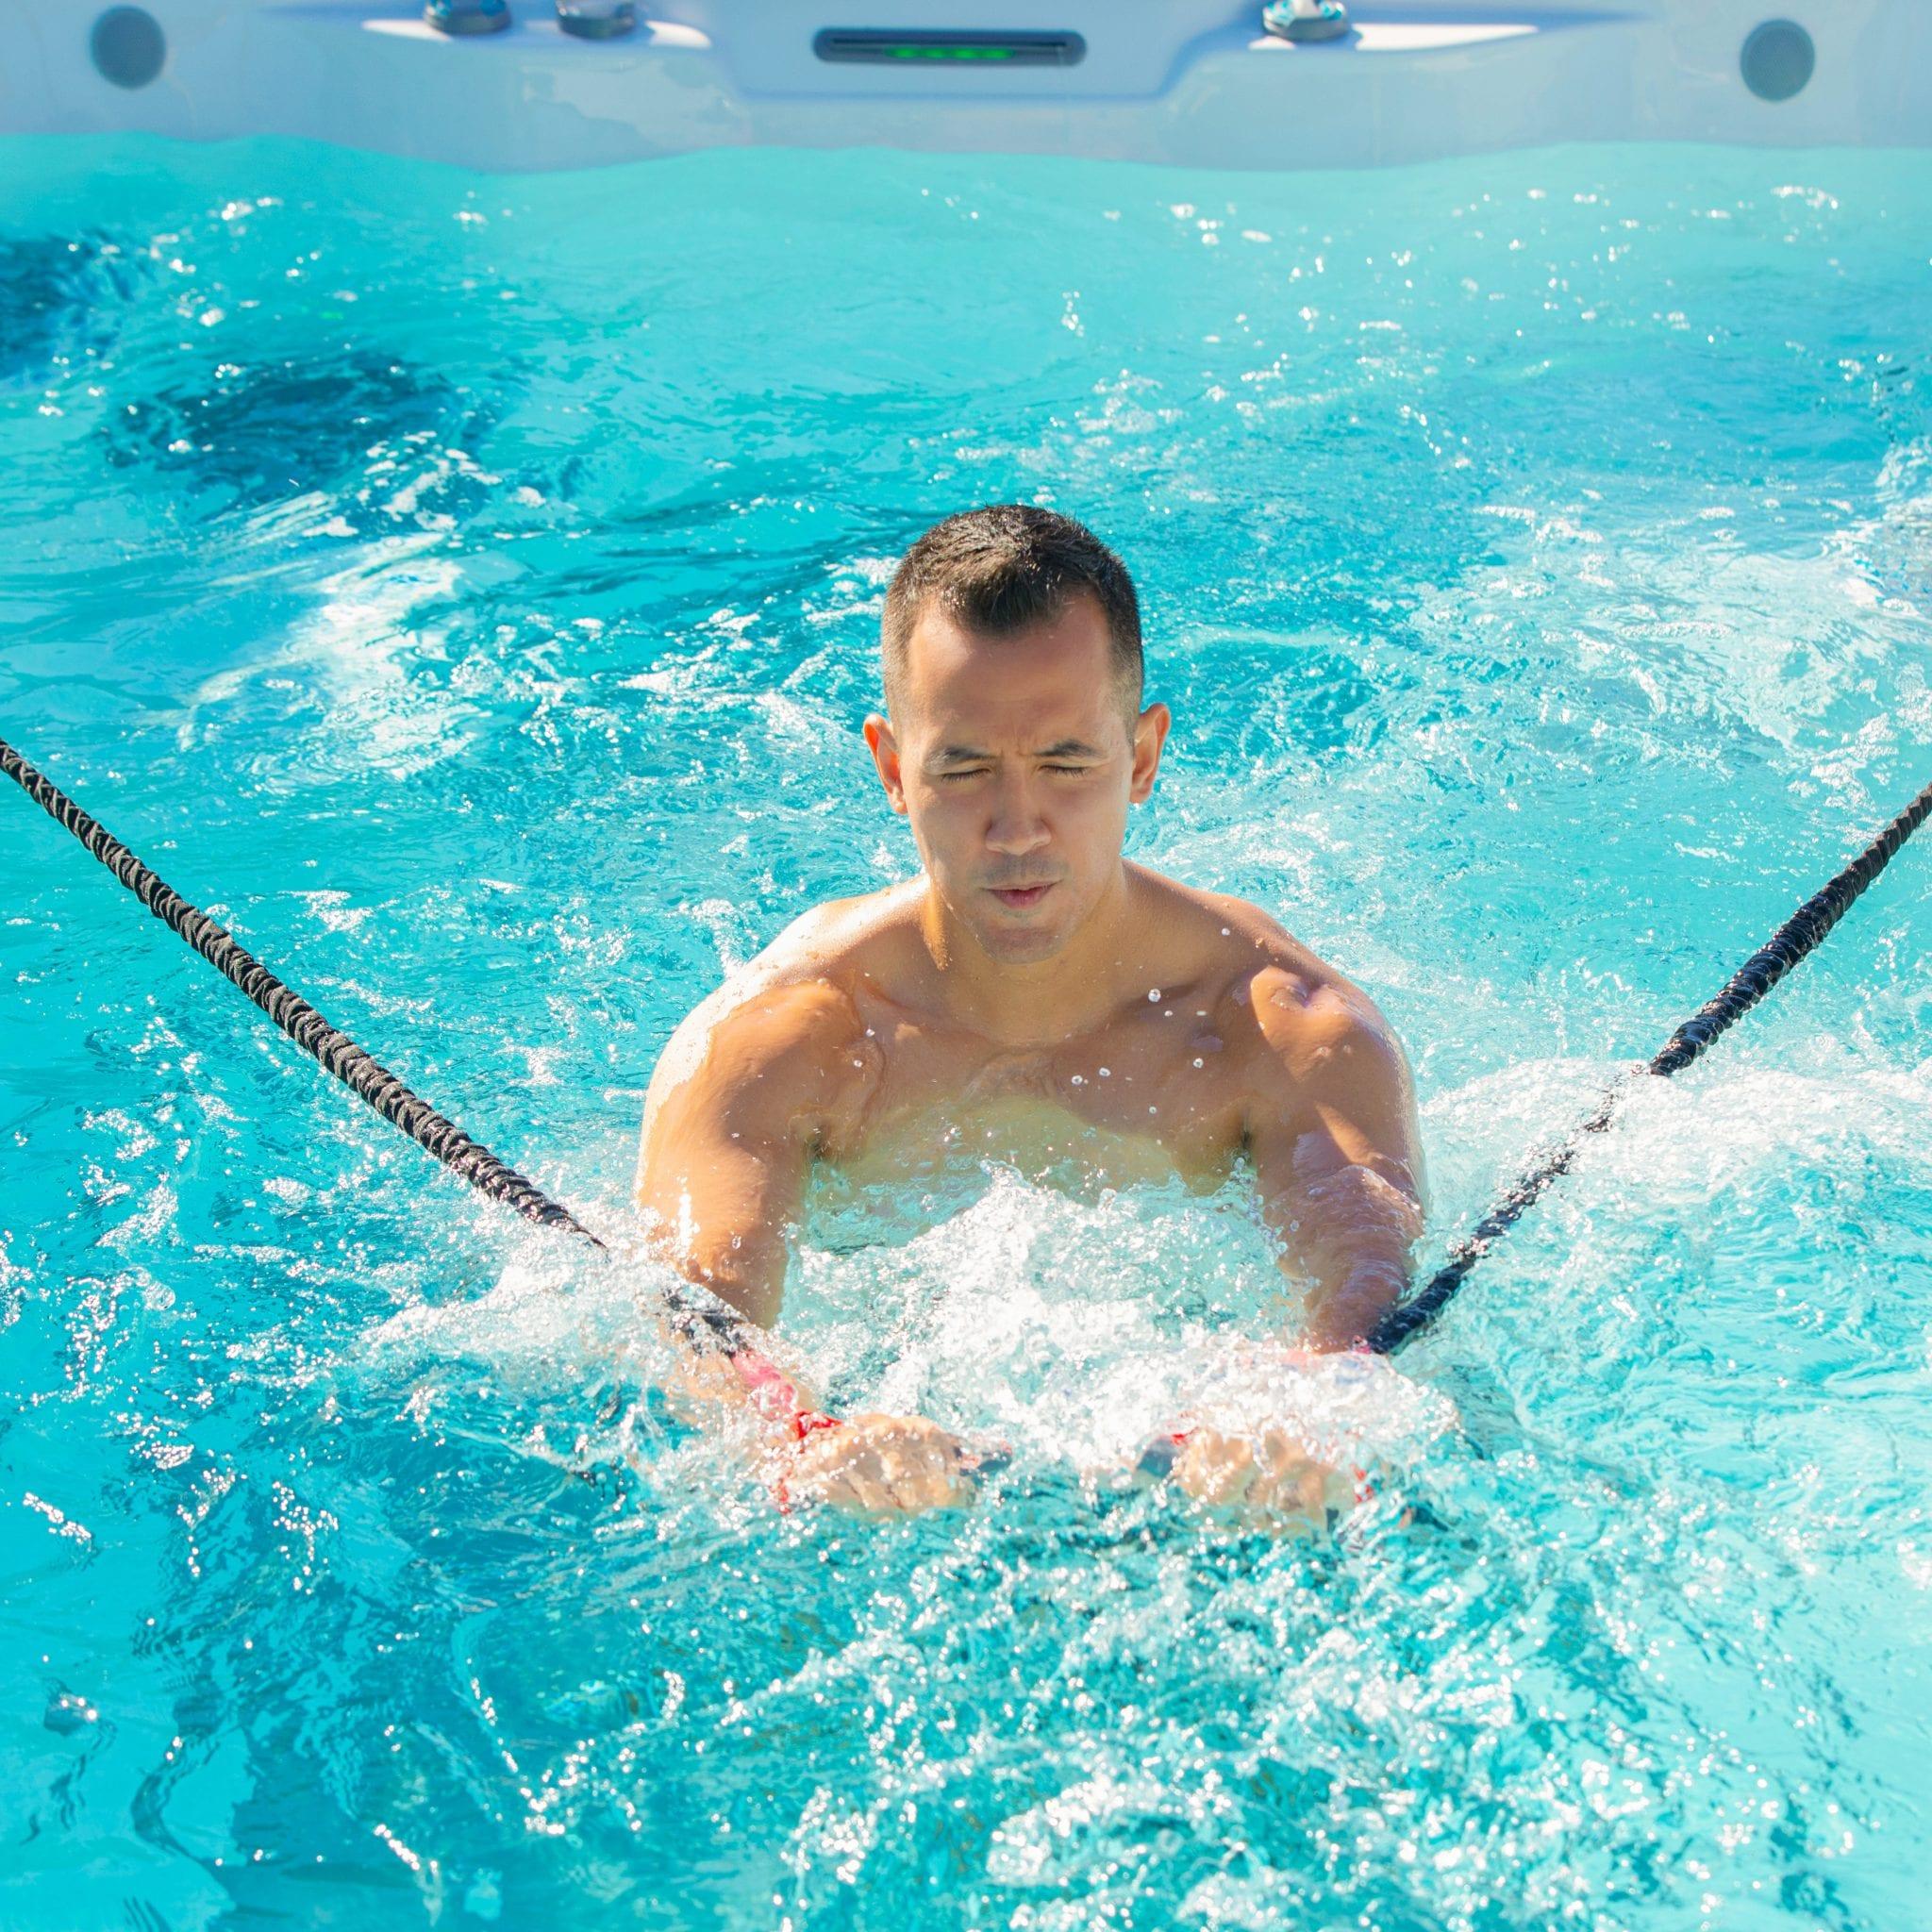 Endless Pools RecSport R500 2020 Alpine White Mocha lifestyle image